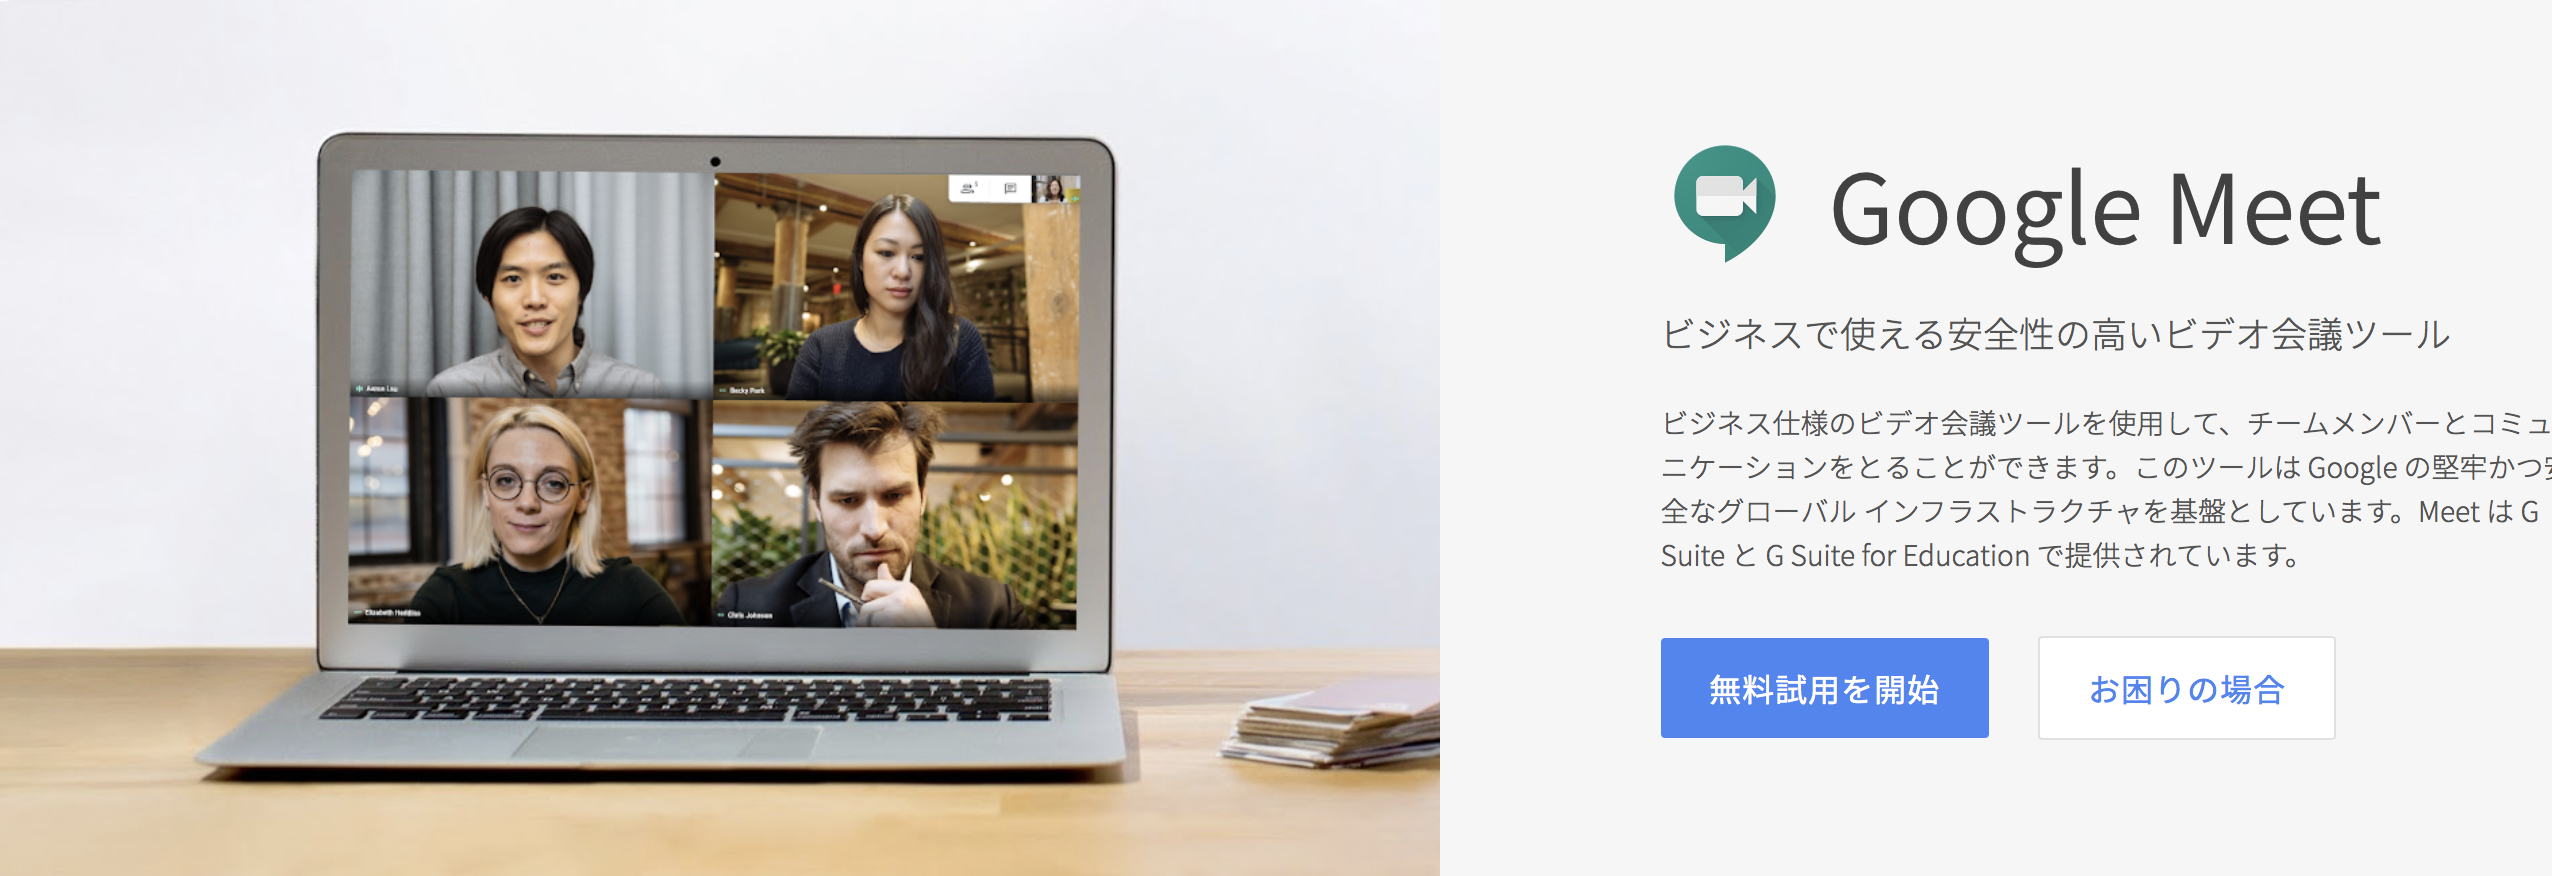 Google Meetフリーランス